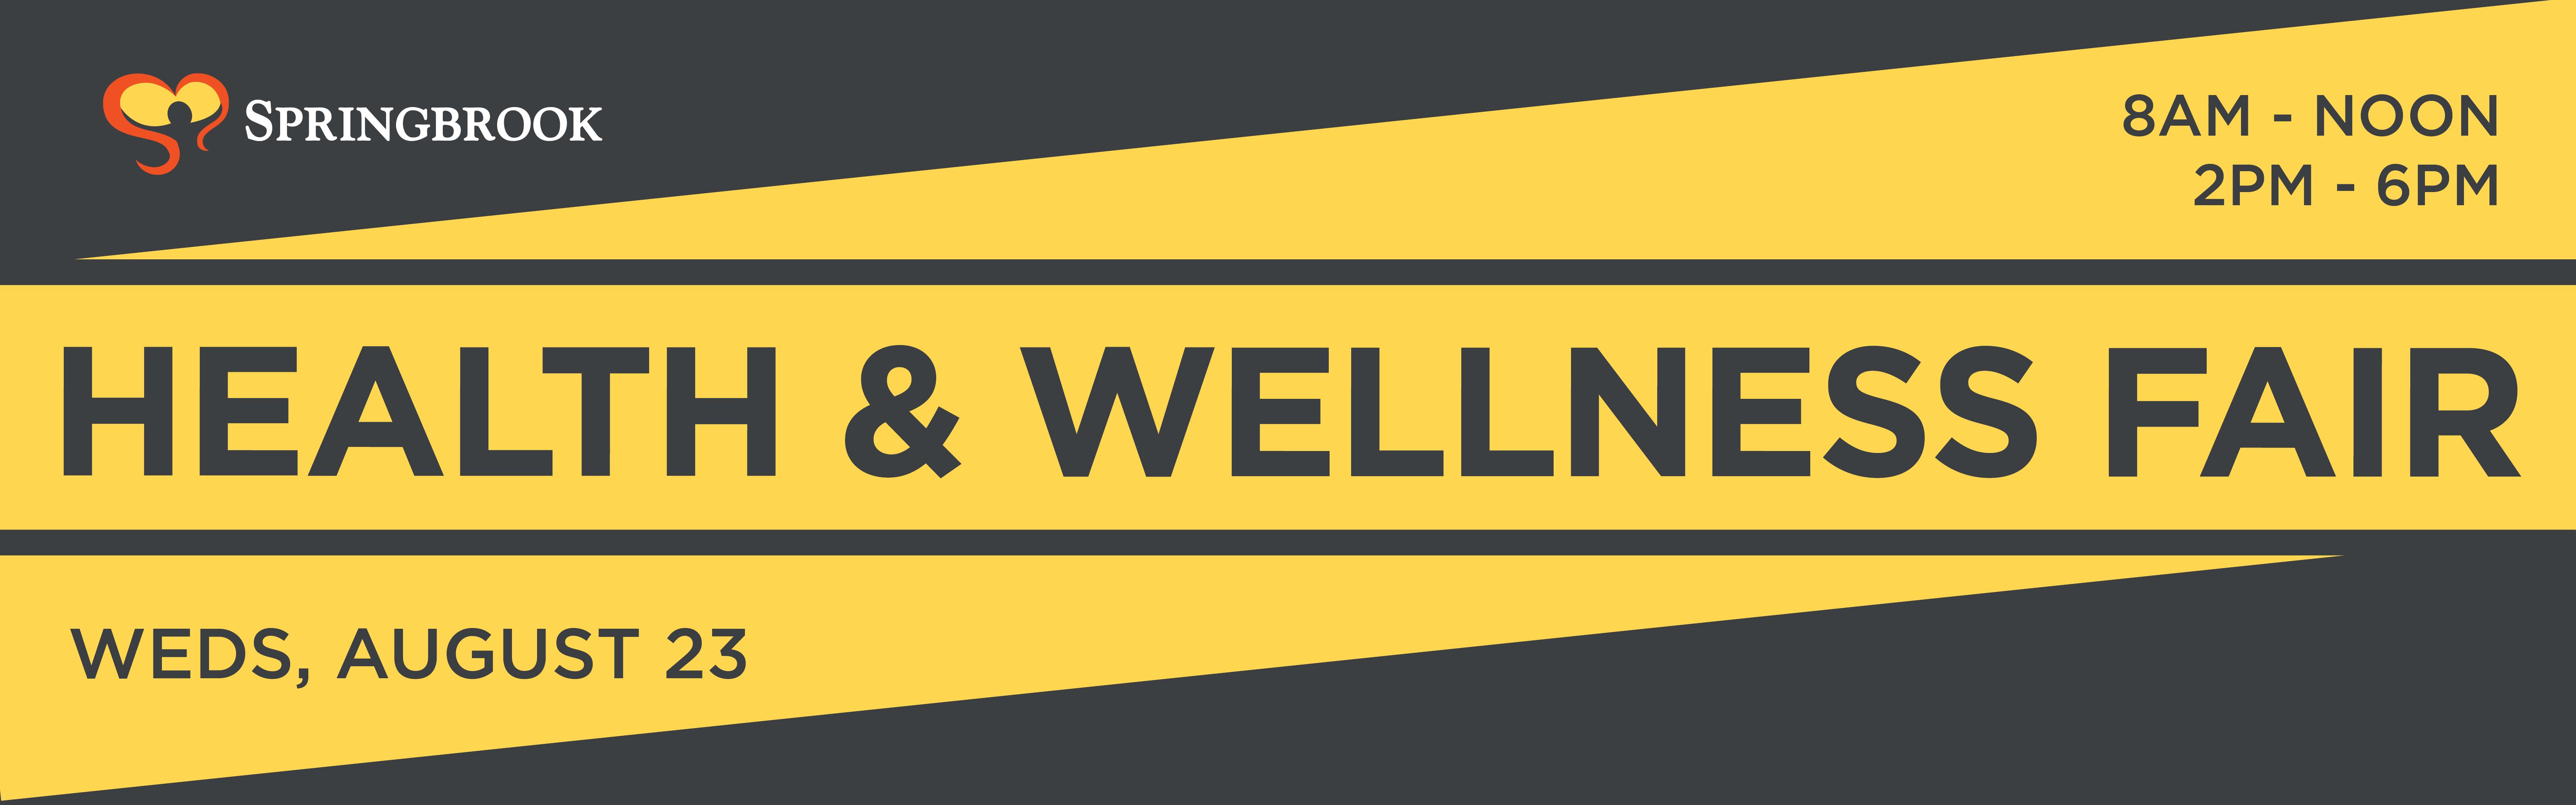 HealthWellnessFair-Banner.png